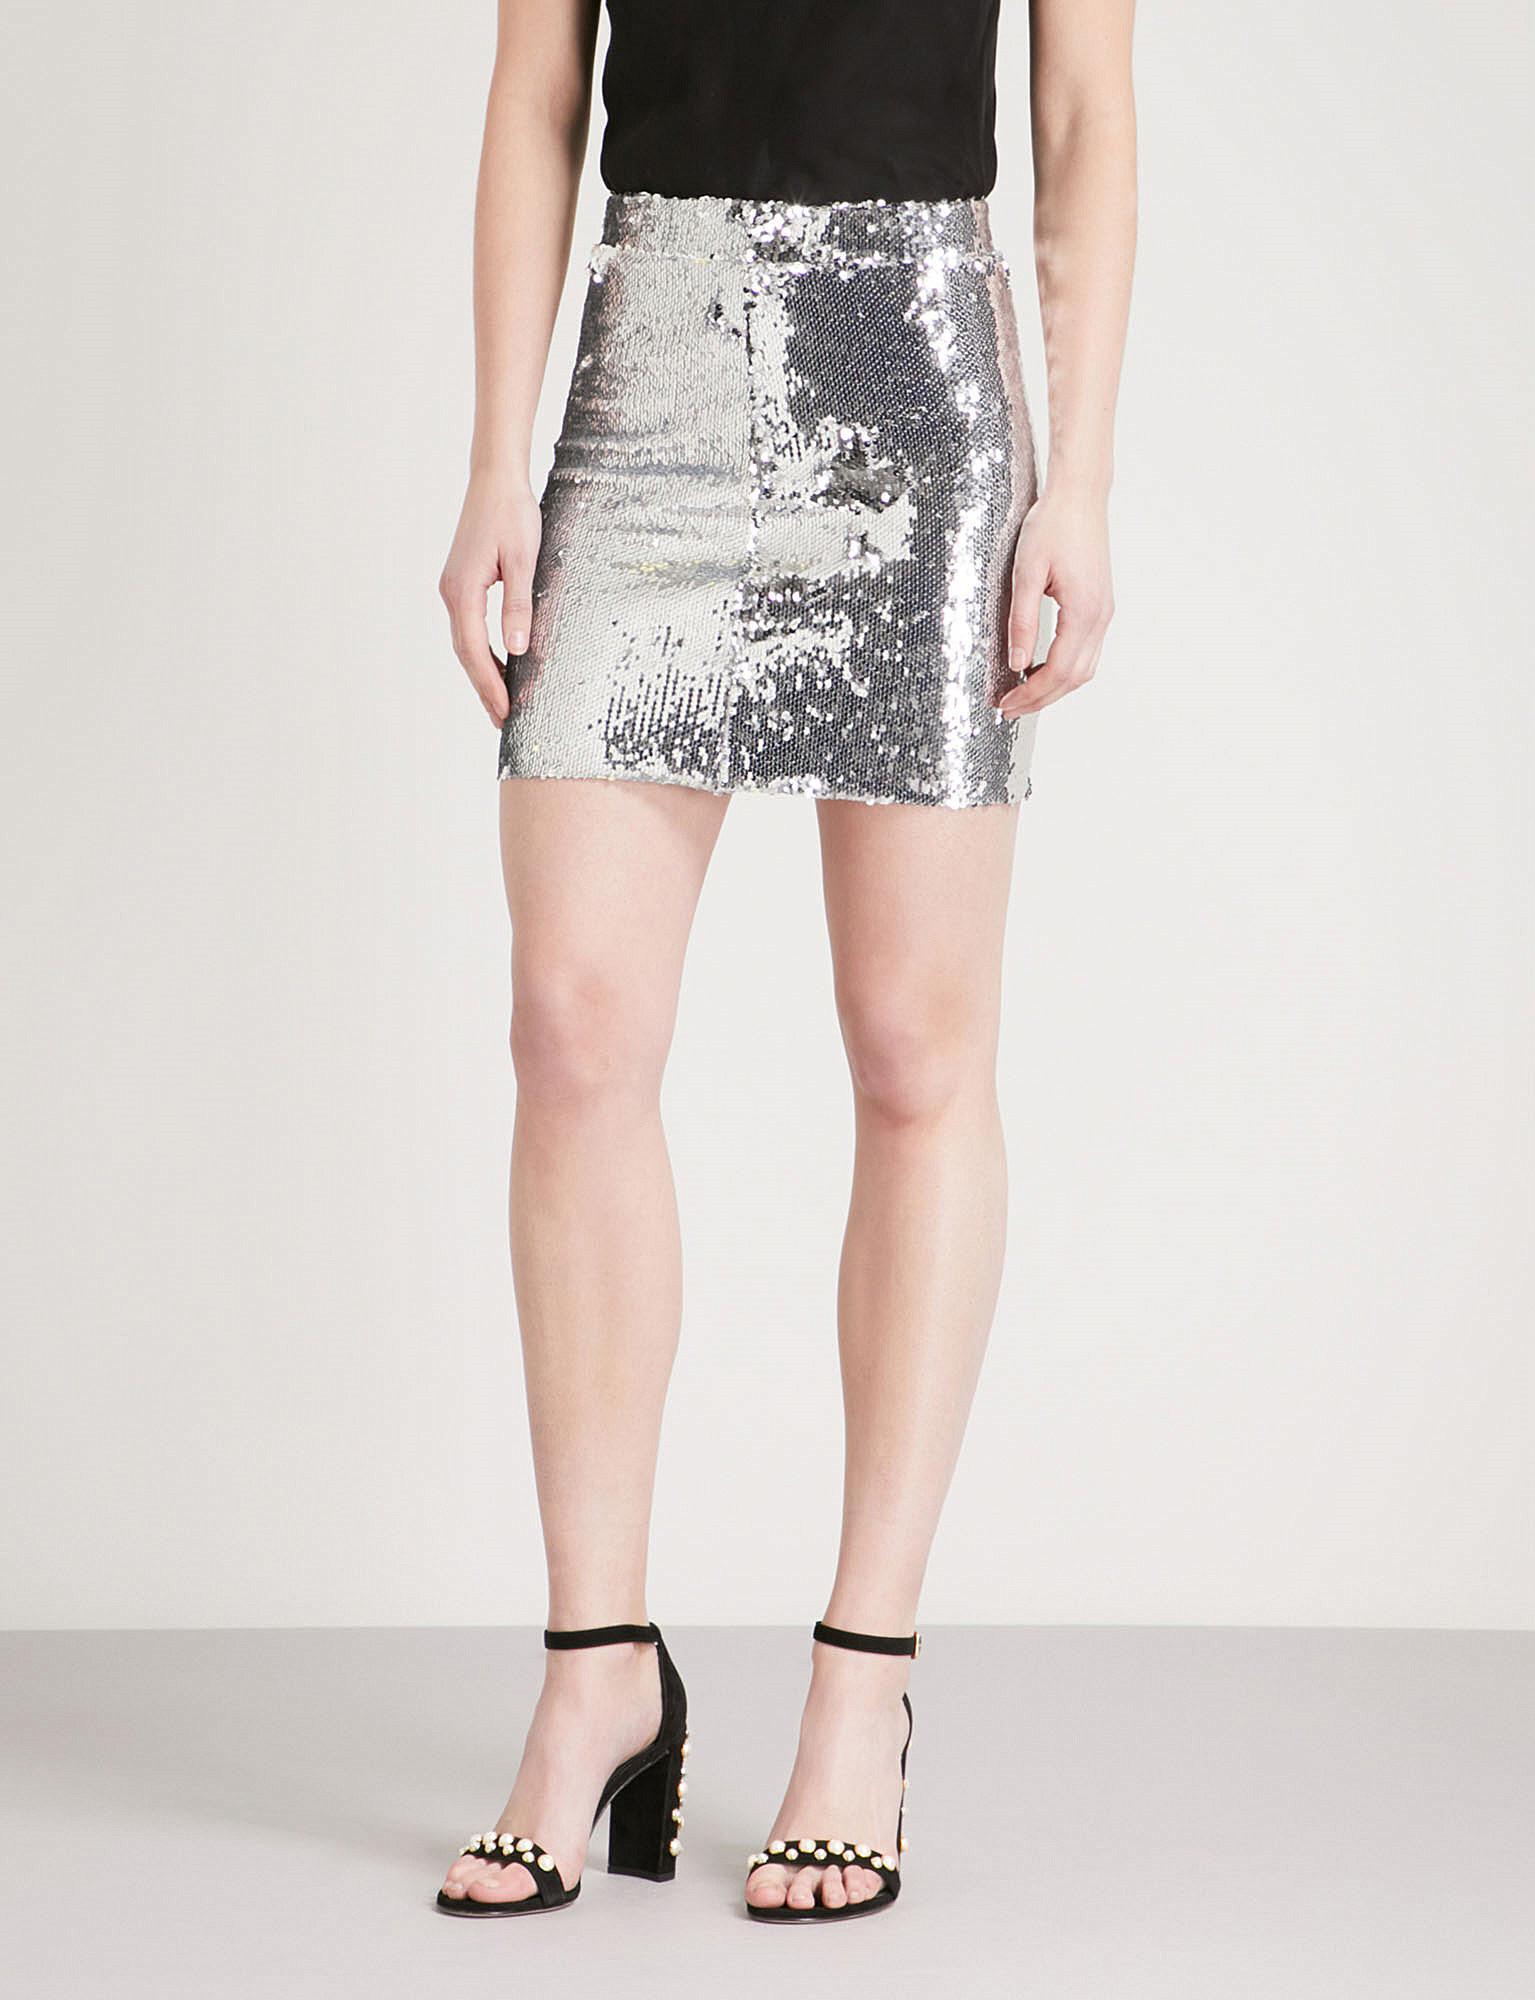 c6f5c6cb09 Mo&co. High-rise Sequin Skirt in Metallic - Lyst